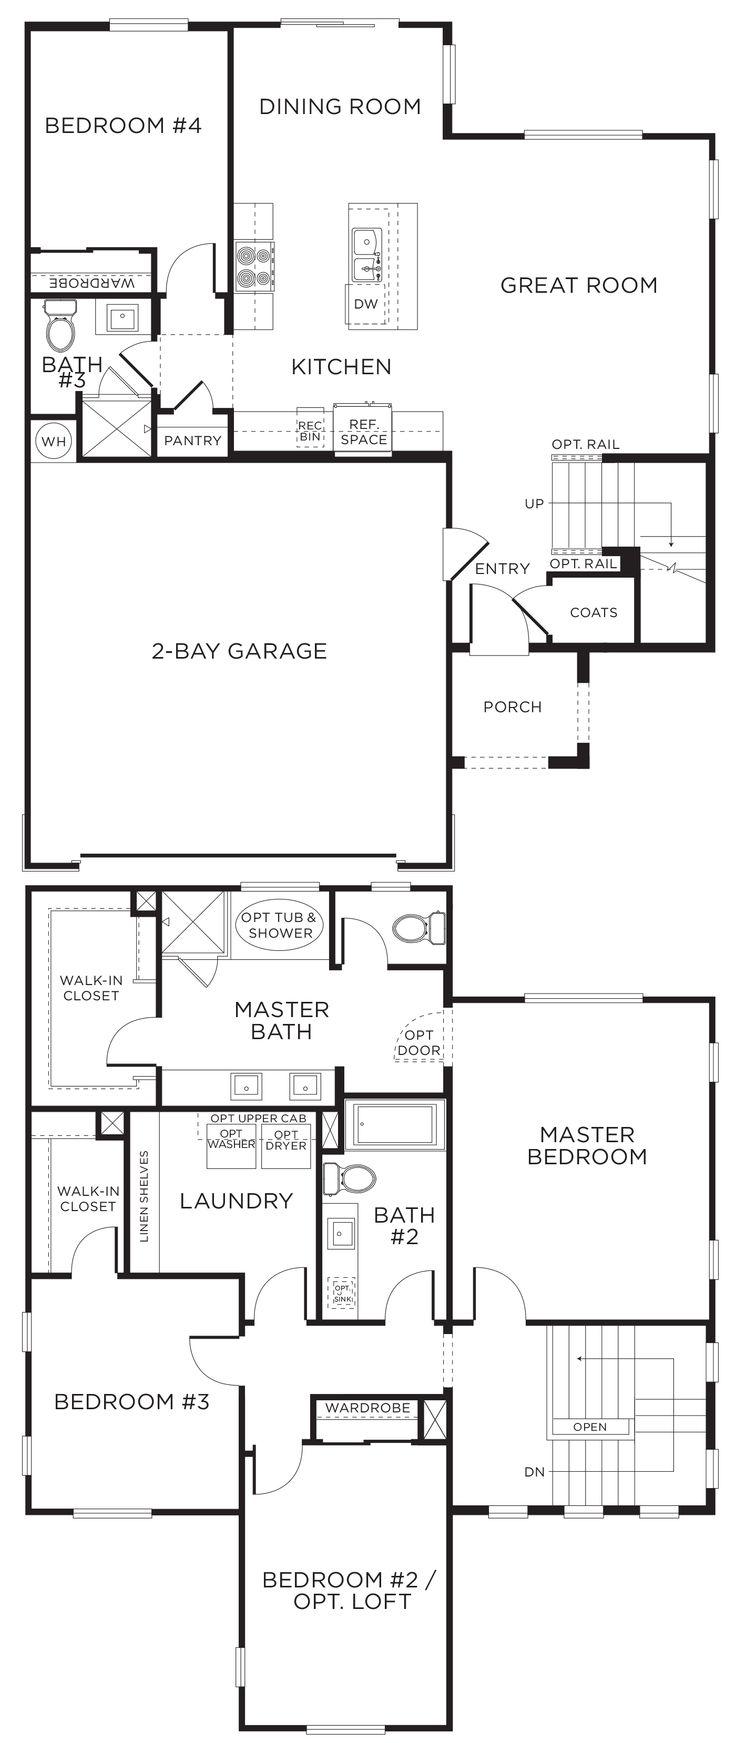 246 best floor plans images on pinterest floor plans seattle estrella plan 3b 4 bedrooms 3 baths 1 919 sq ft